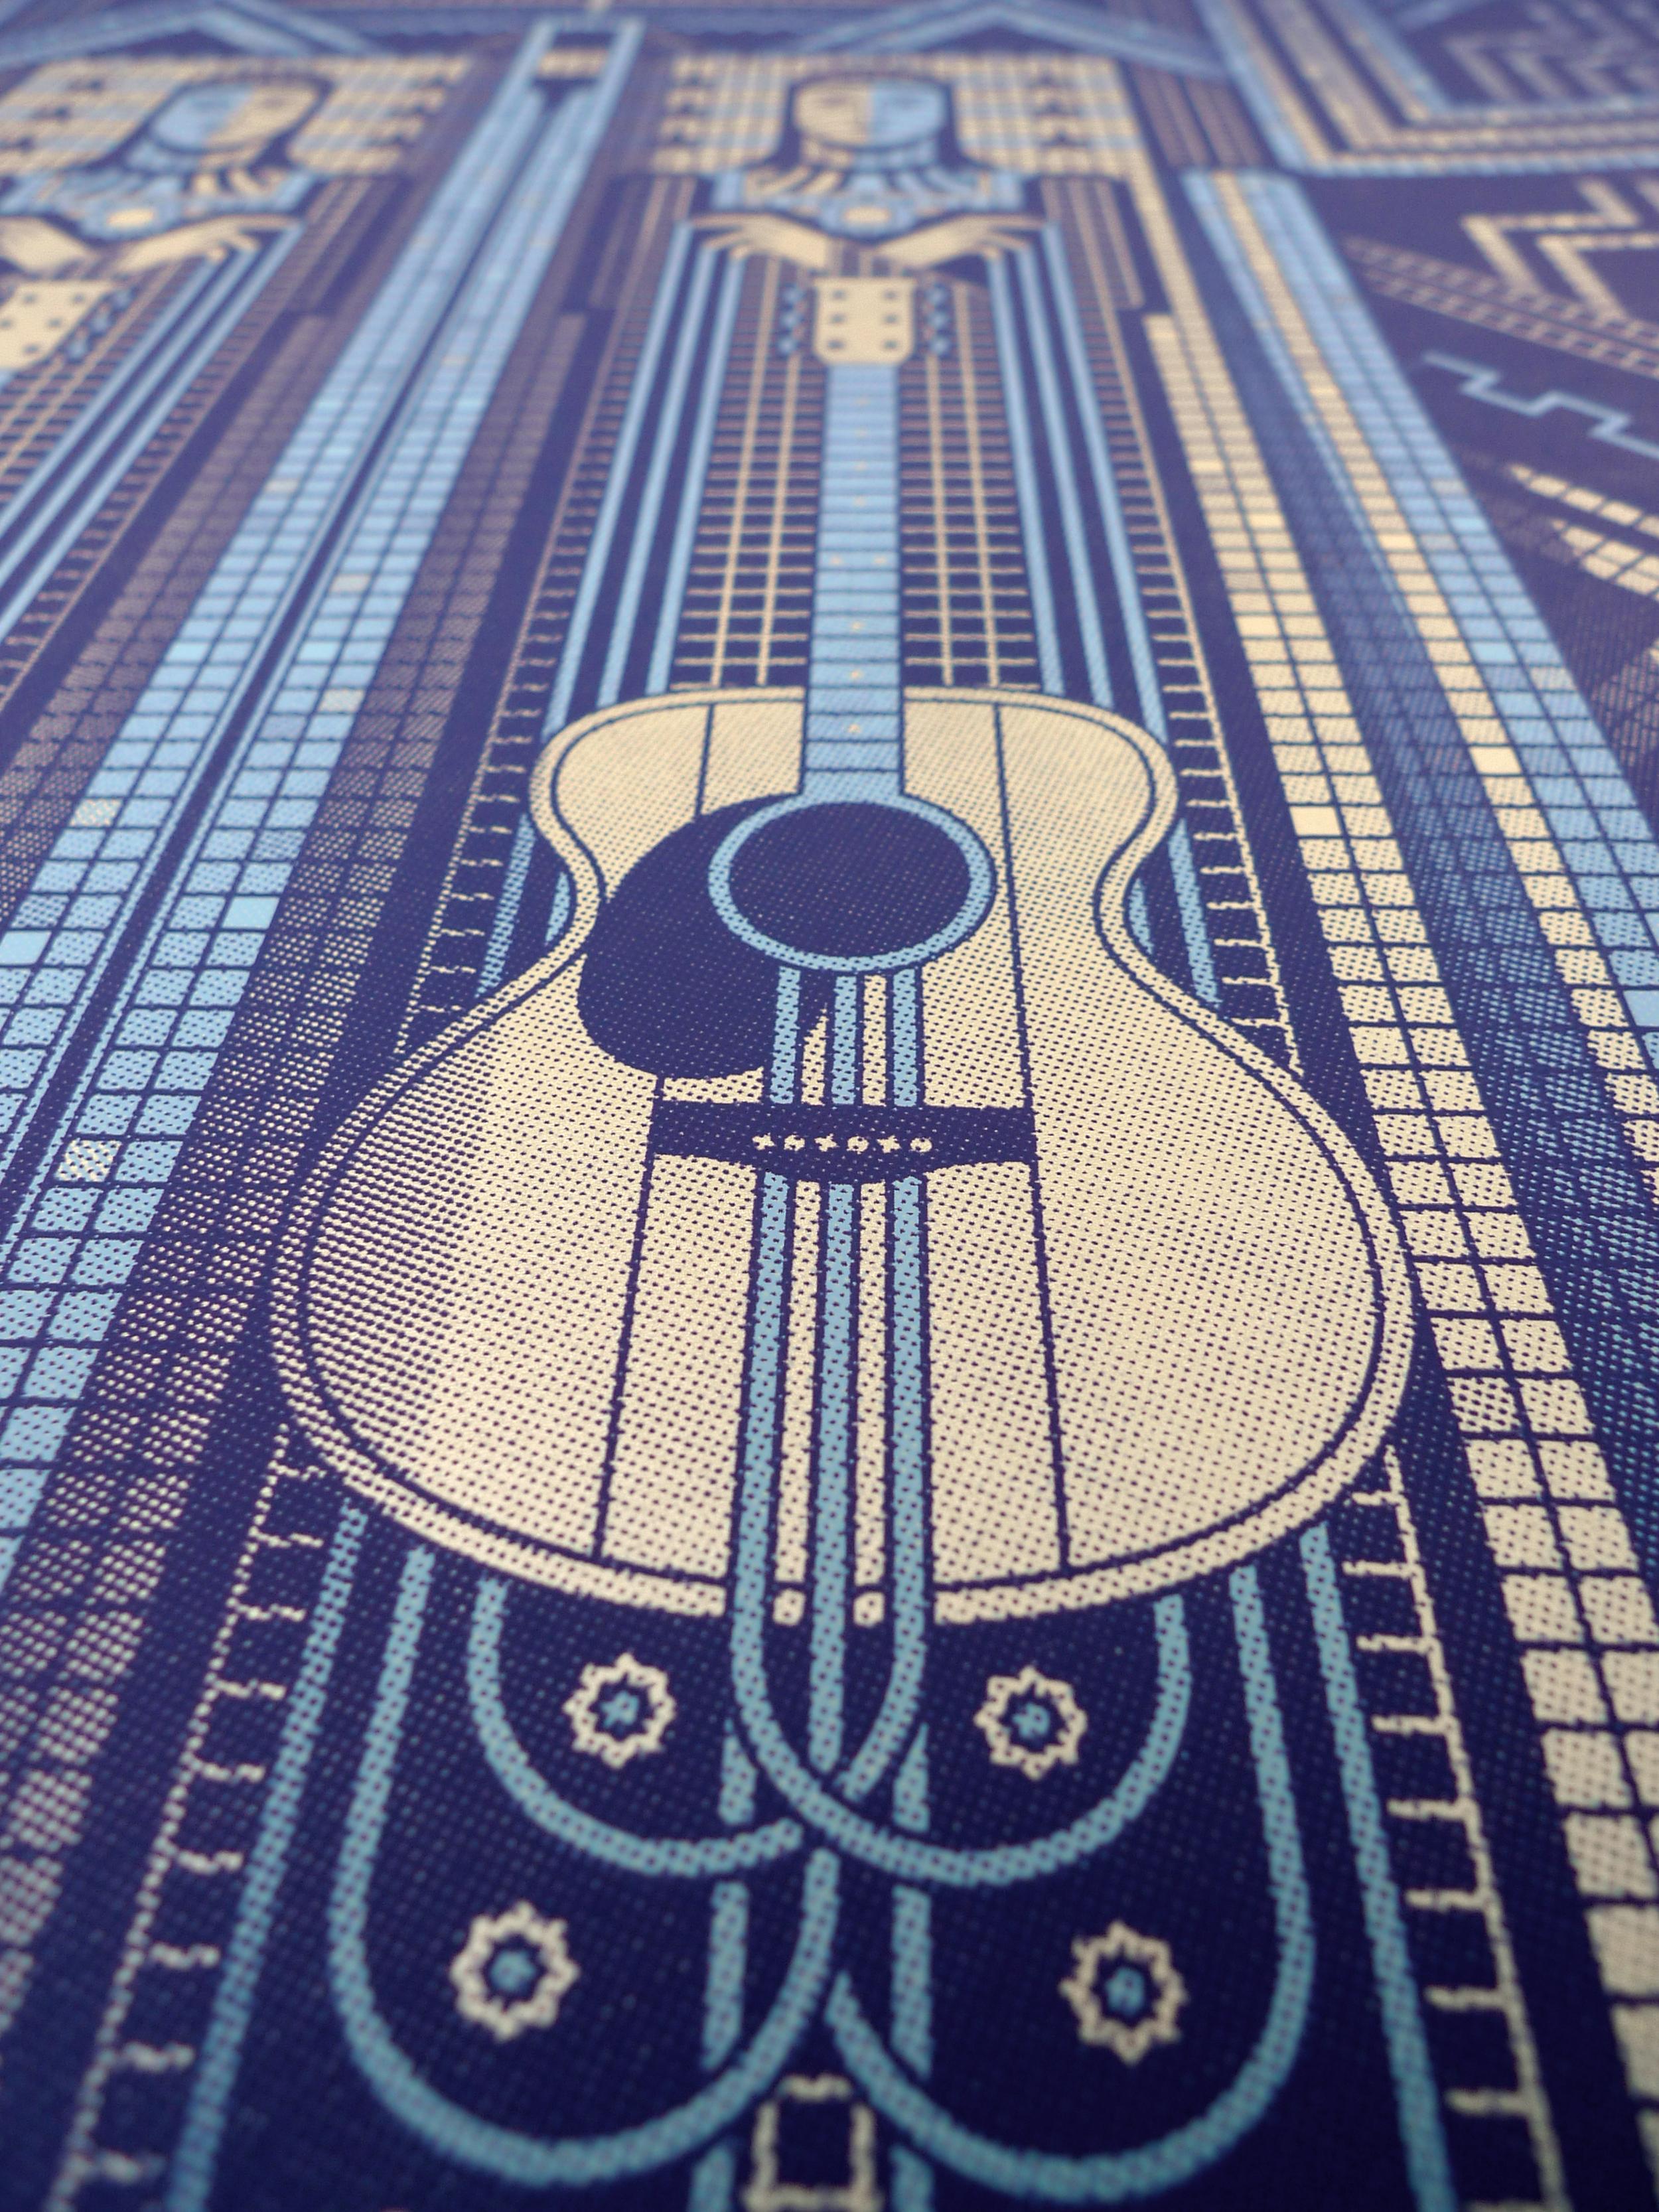 Dave Matthews & Tim Reynolds Gig Poster by DKNG